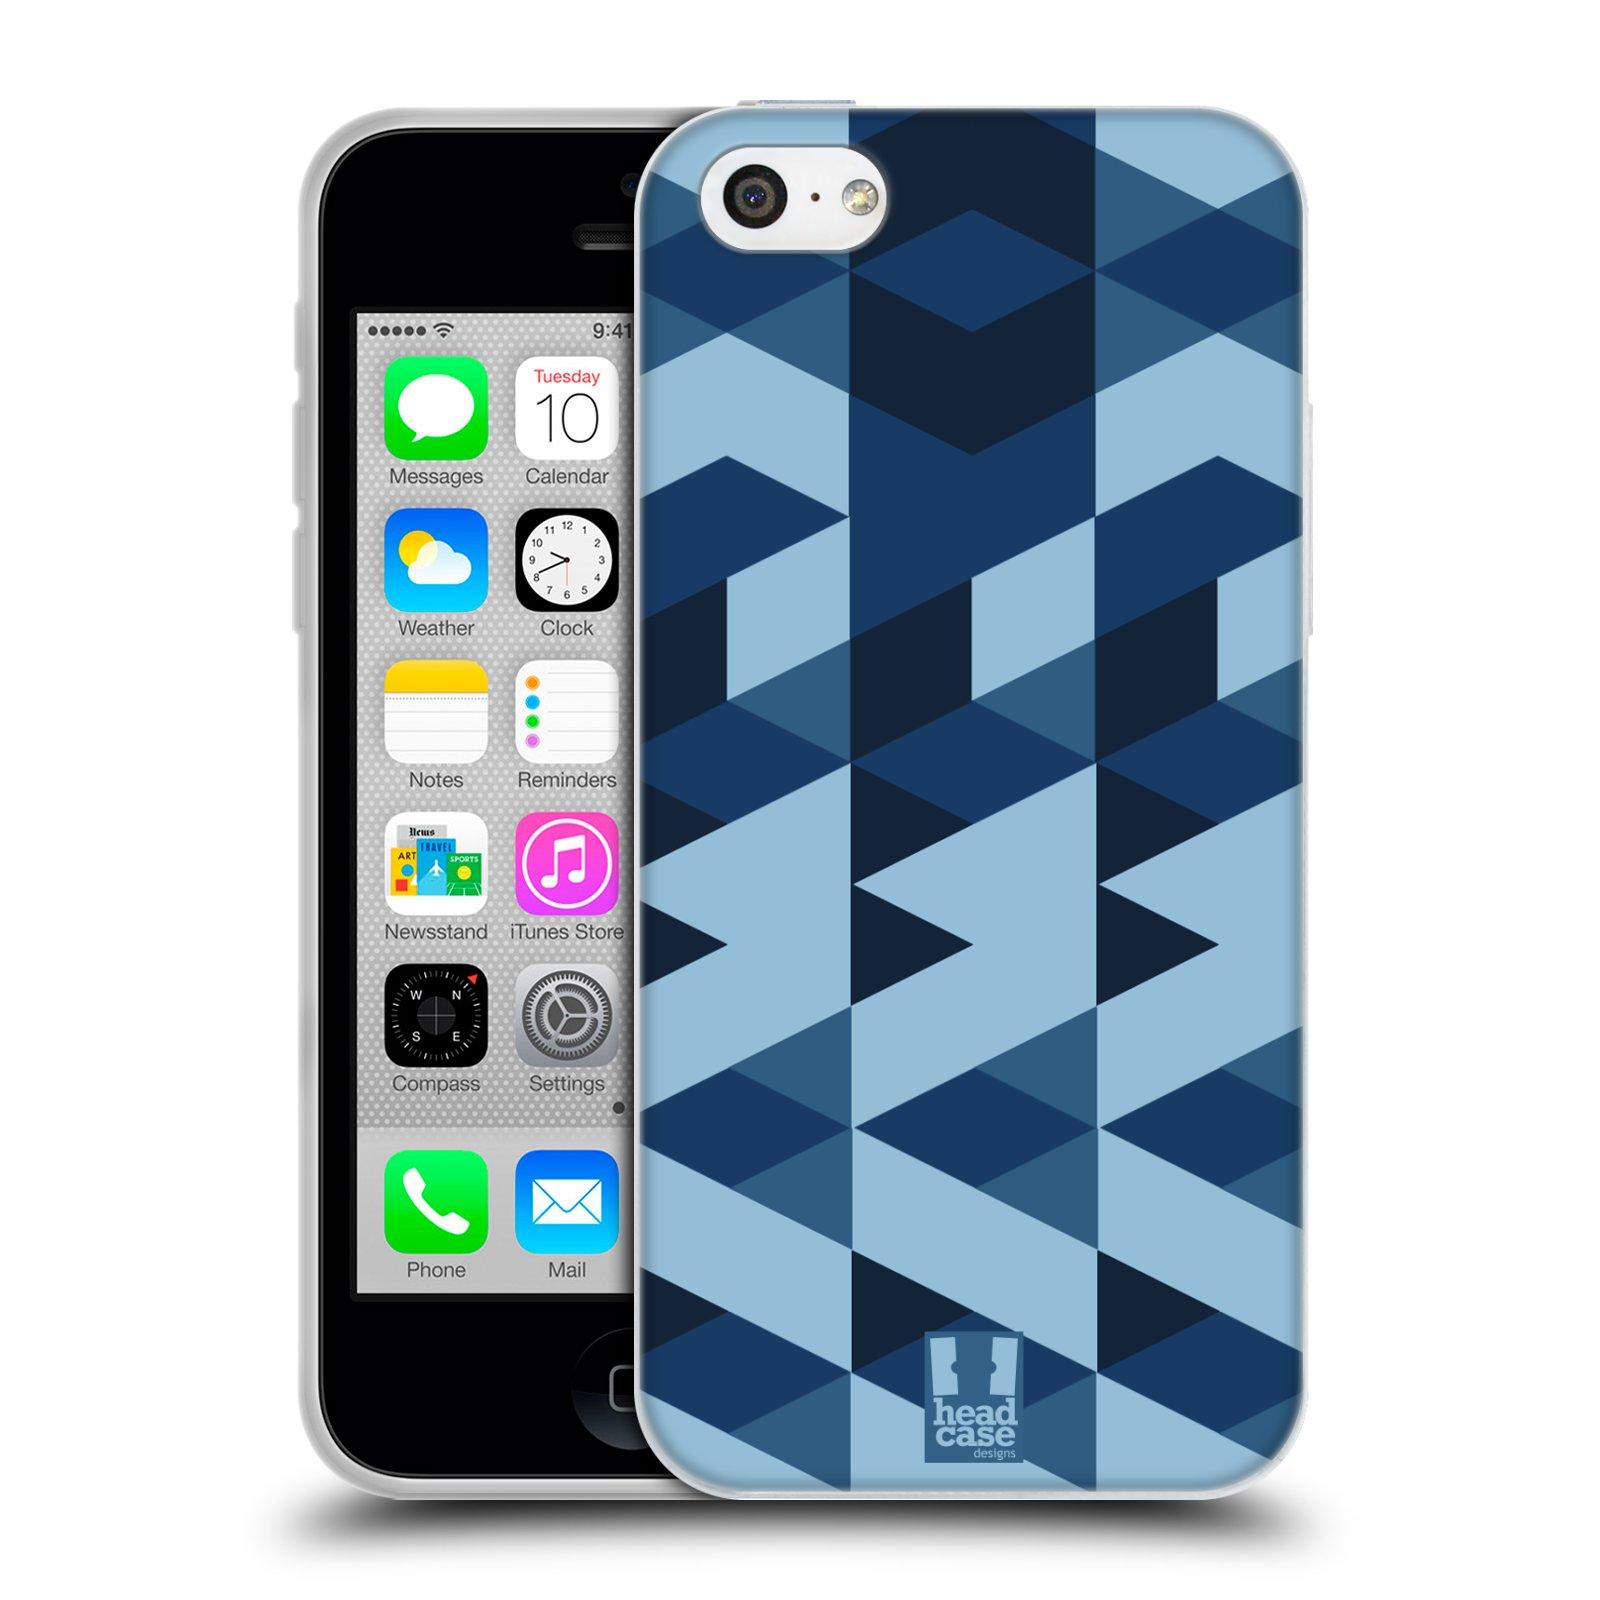 Silikonové pouzdro na mobil Apple iPhone 5C HEAD CASE GEOMETRIC BLUE (Silikonový kryt či obal na mobilní telefon Apple iPhone 5C)